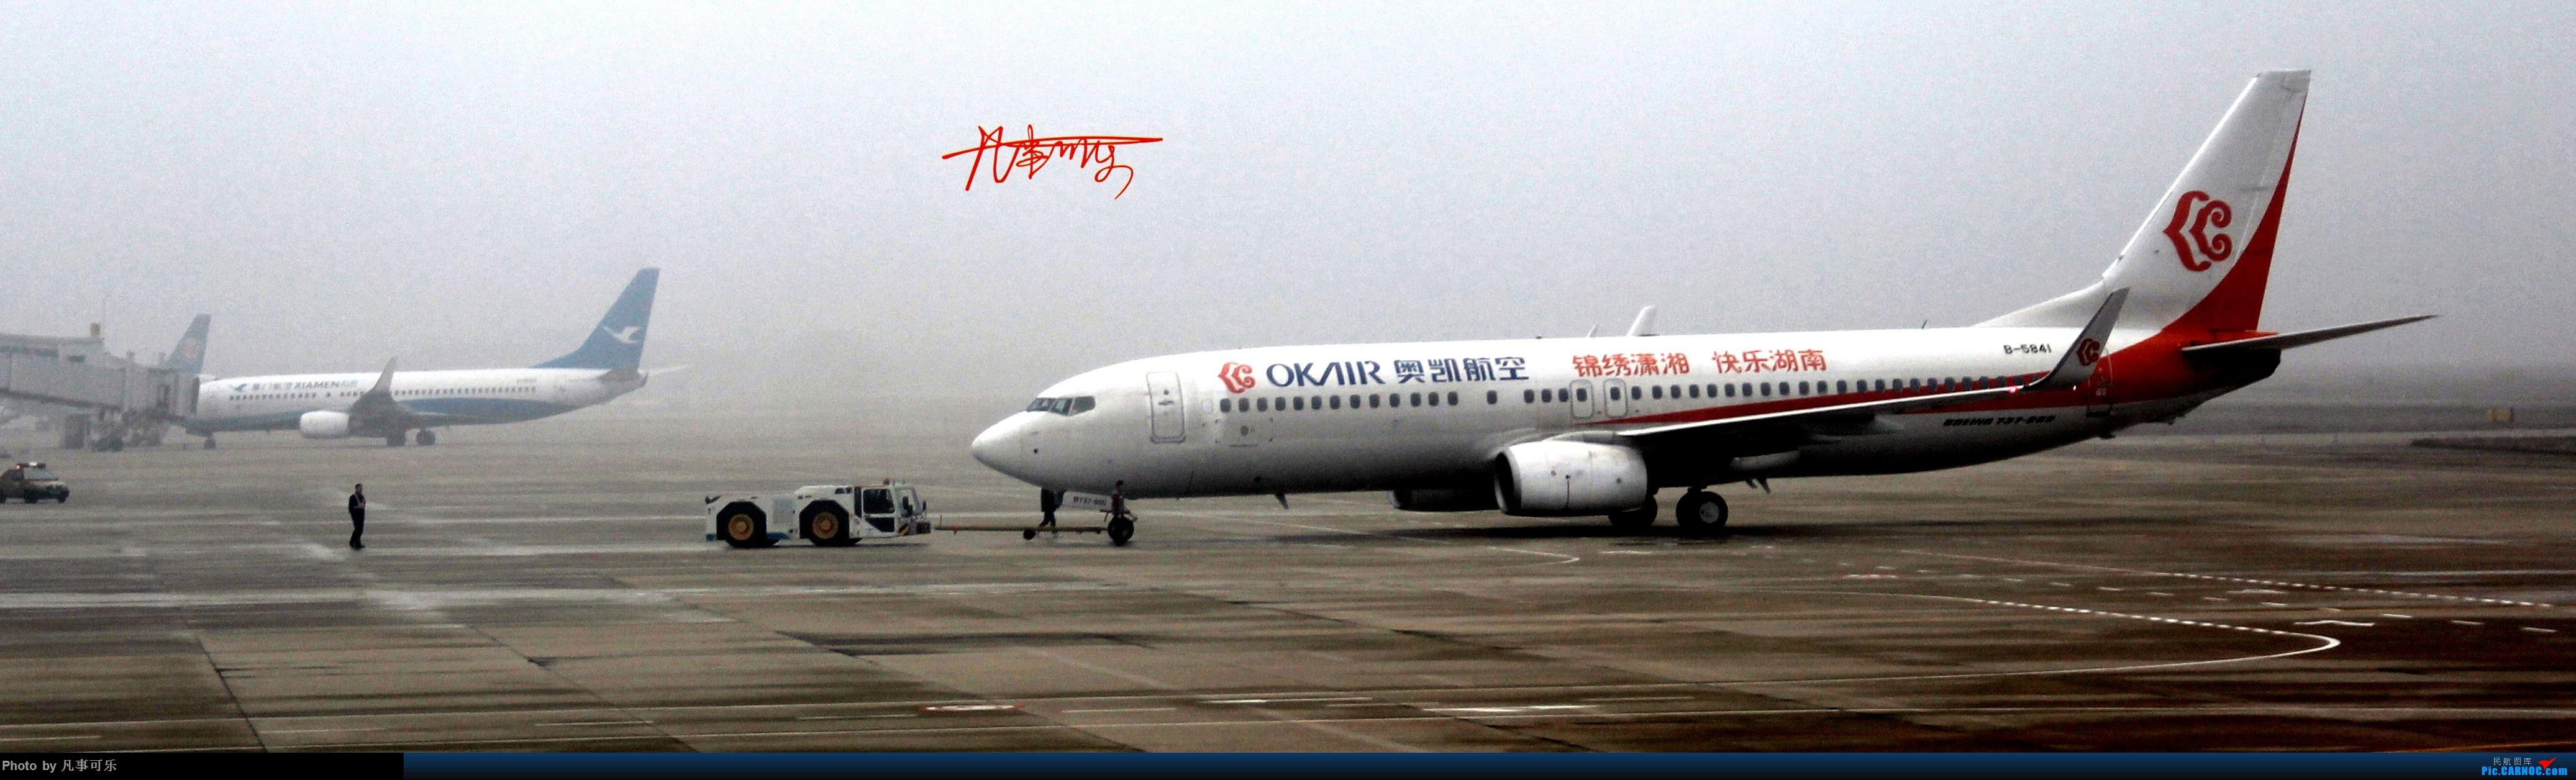 Re:[原创]这几年国内外拍的一些机 BOEING 737-800 B-5841 长沙黄花机场